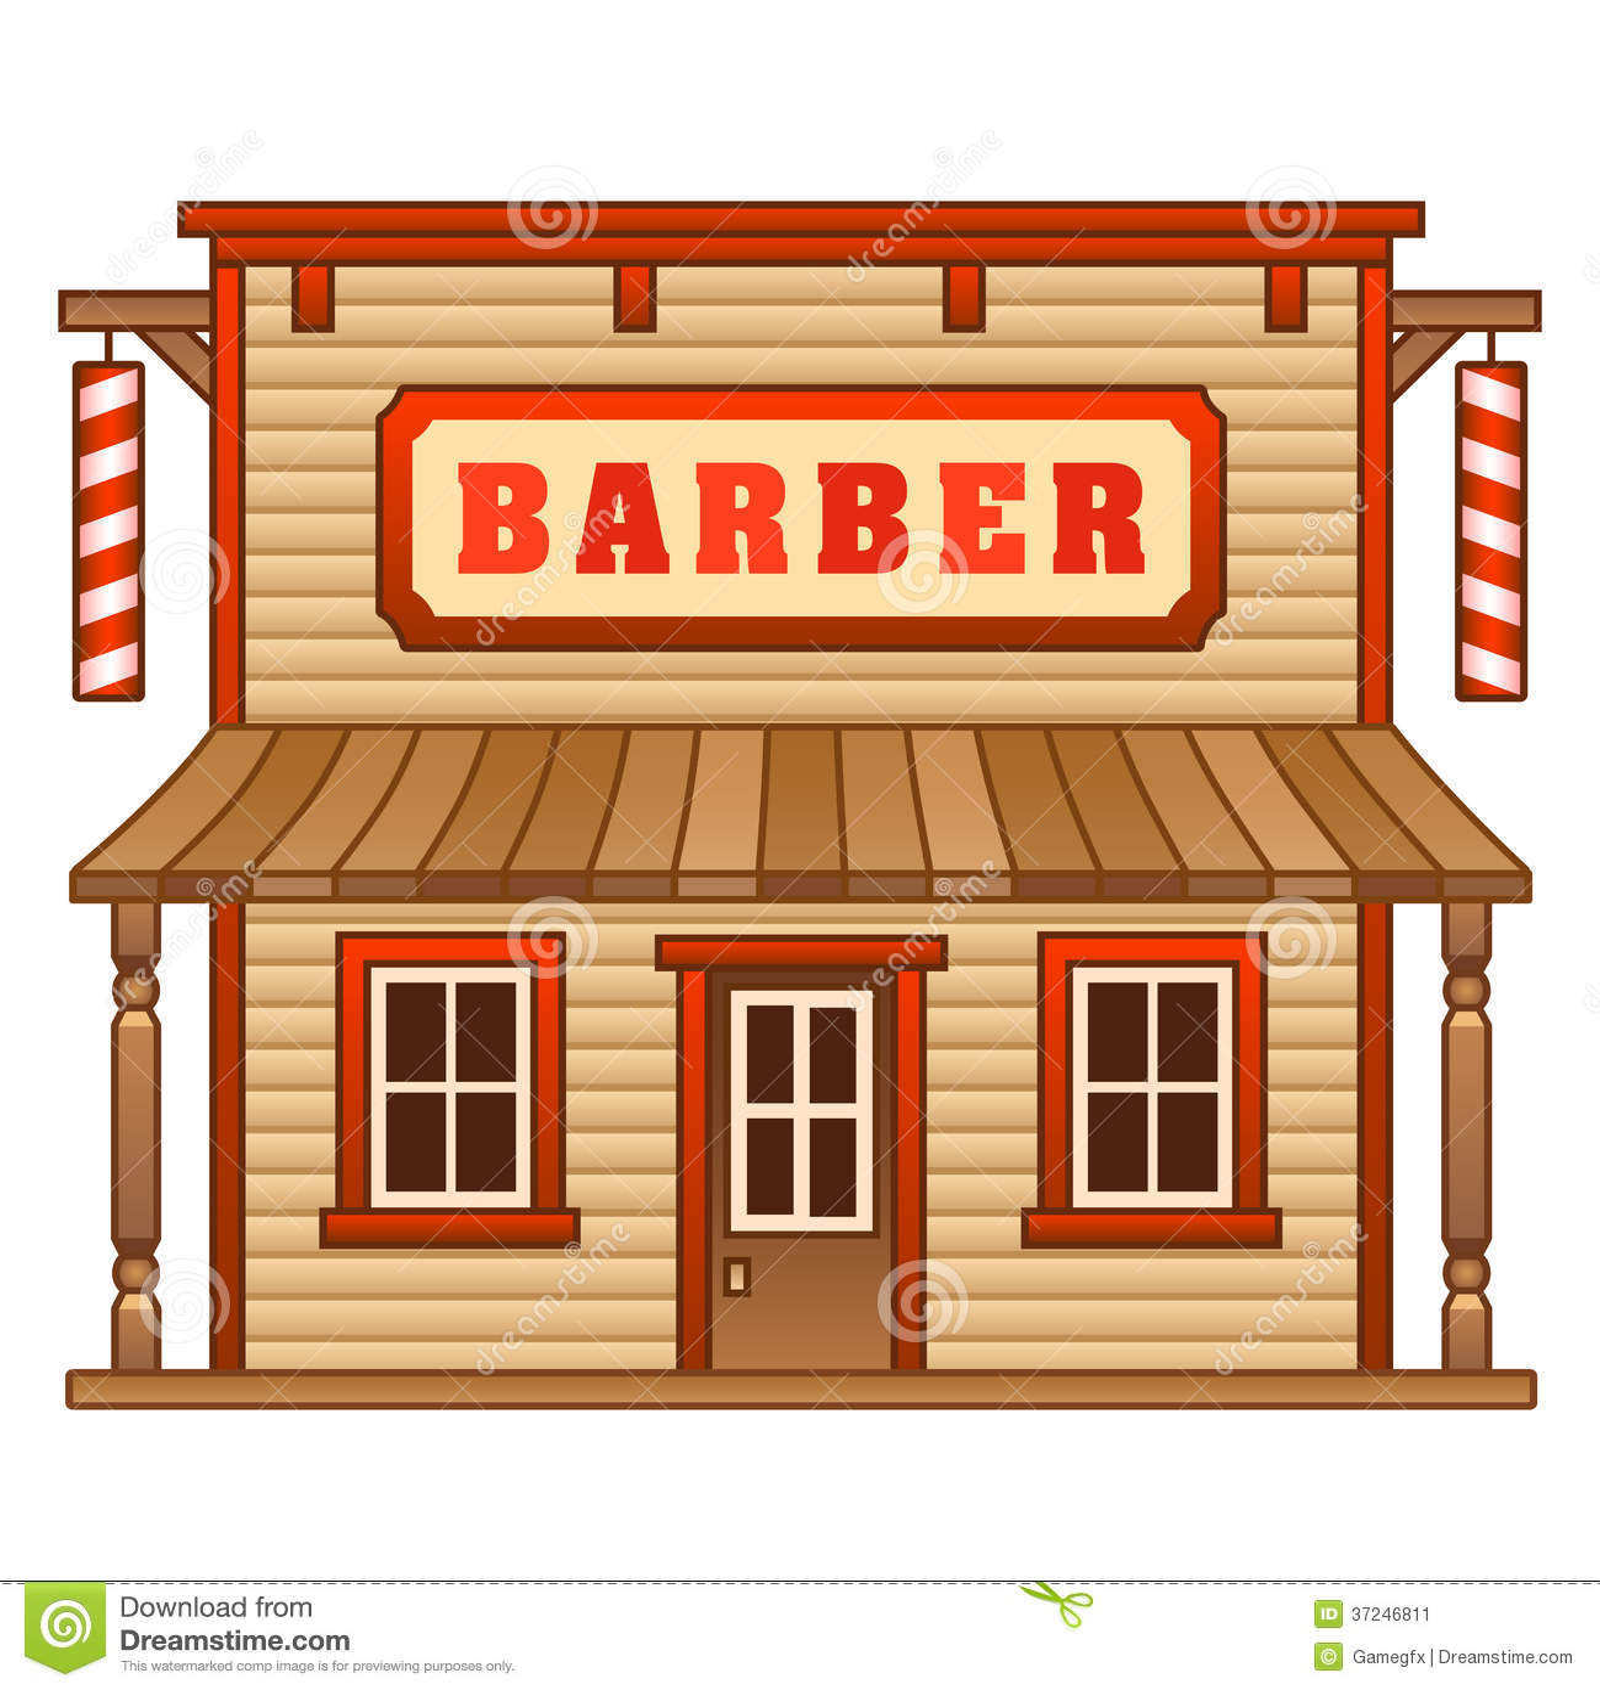 Wild West Barber Shop Stock Image - Image: 37246811